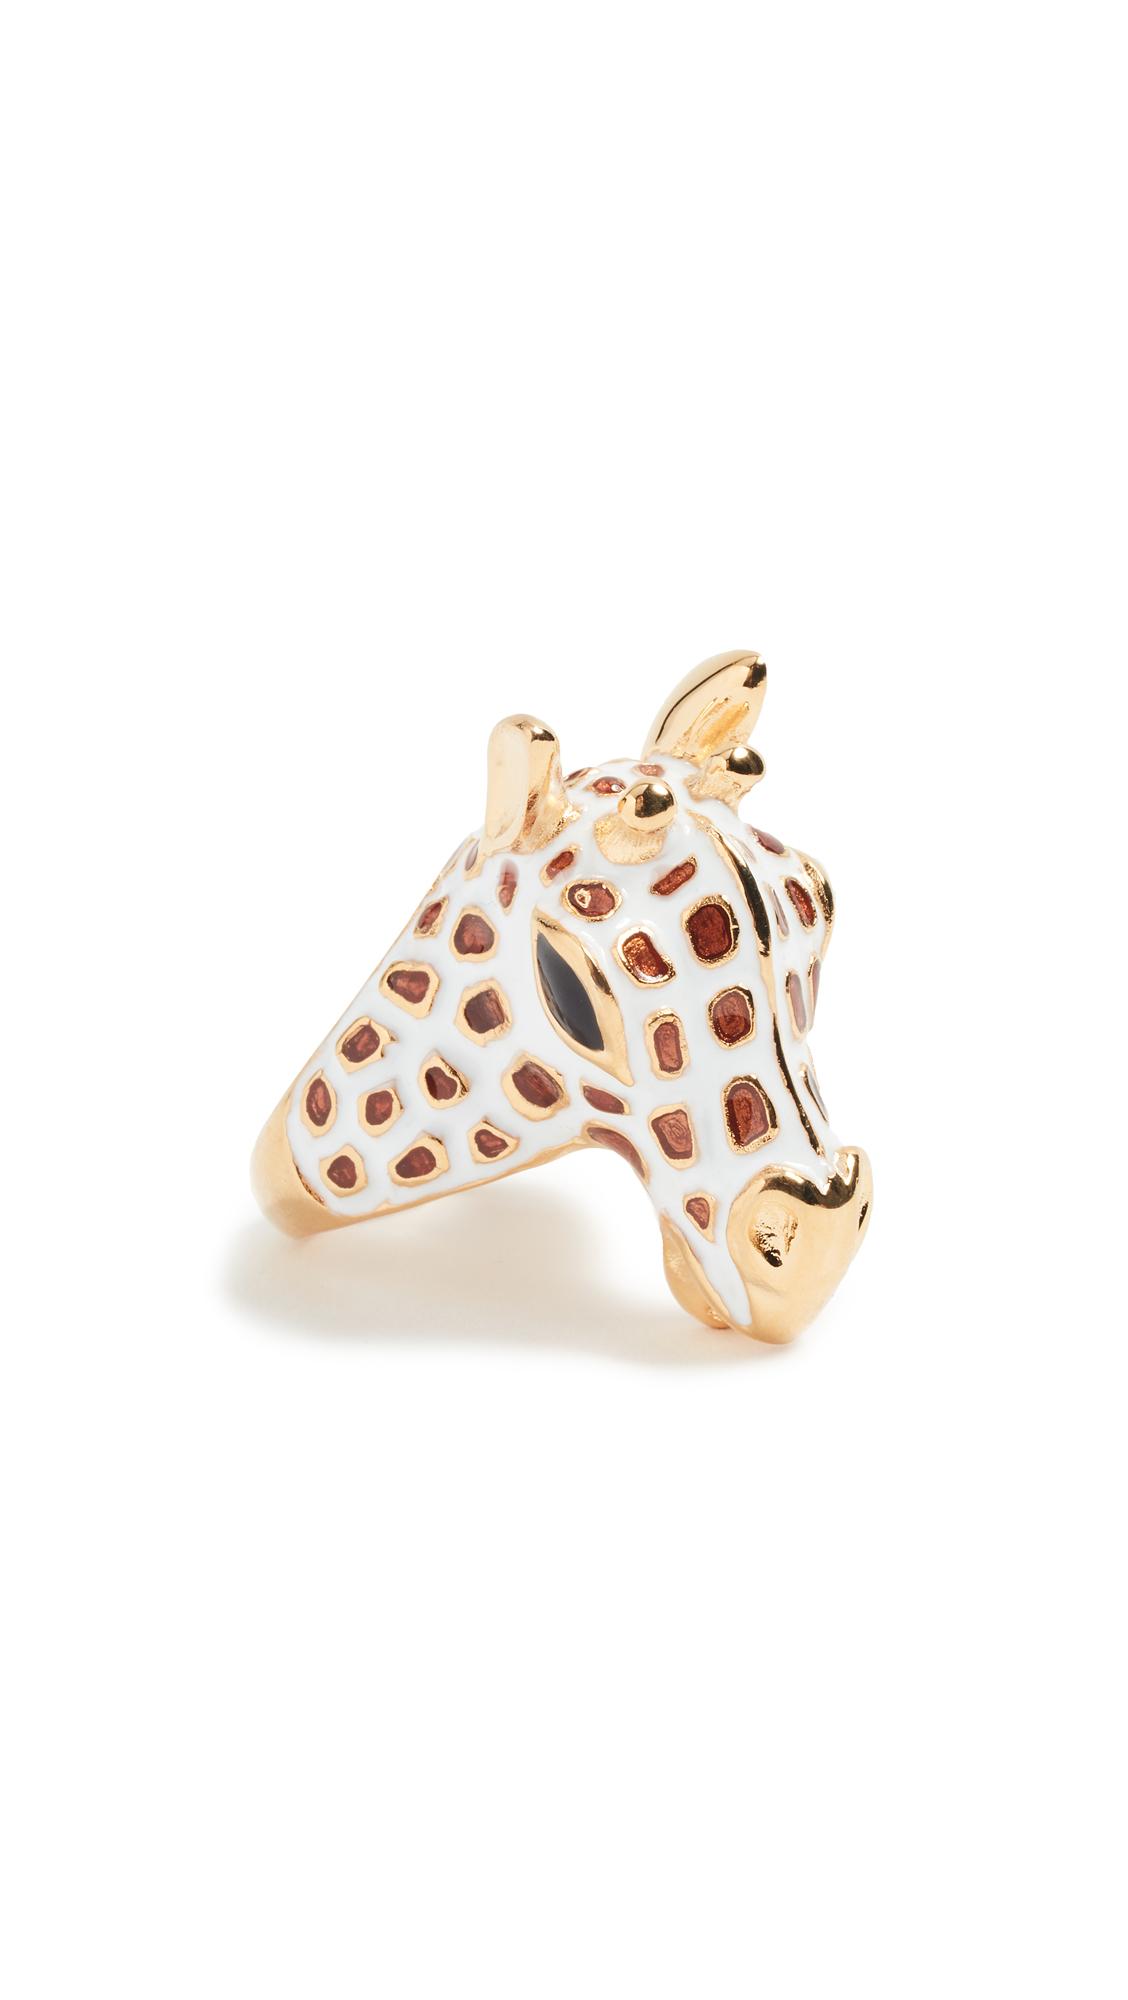 Kenneth Jay Lane Giraffe Head Ring - White/Tan White/tan F8arOGy5M